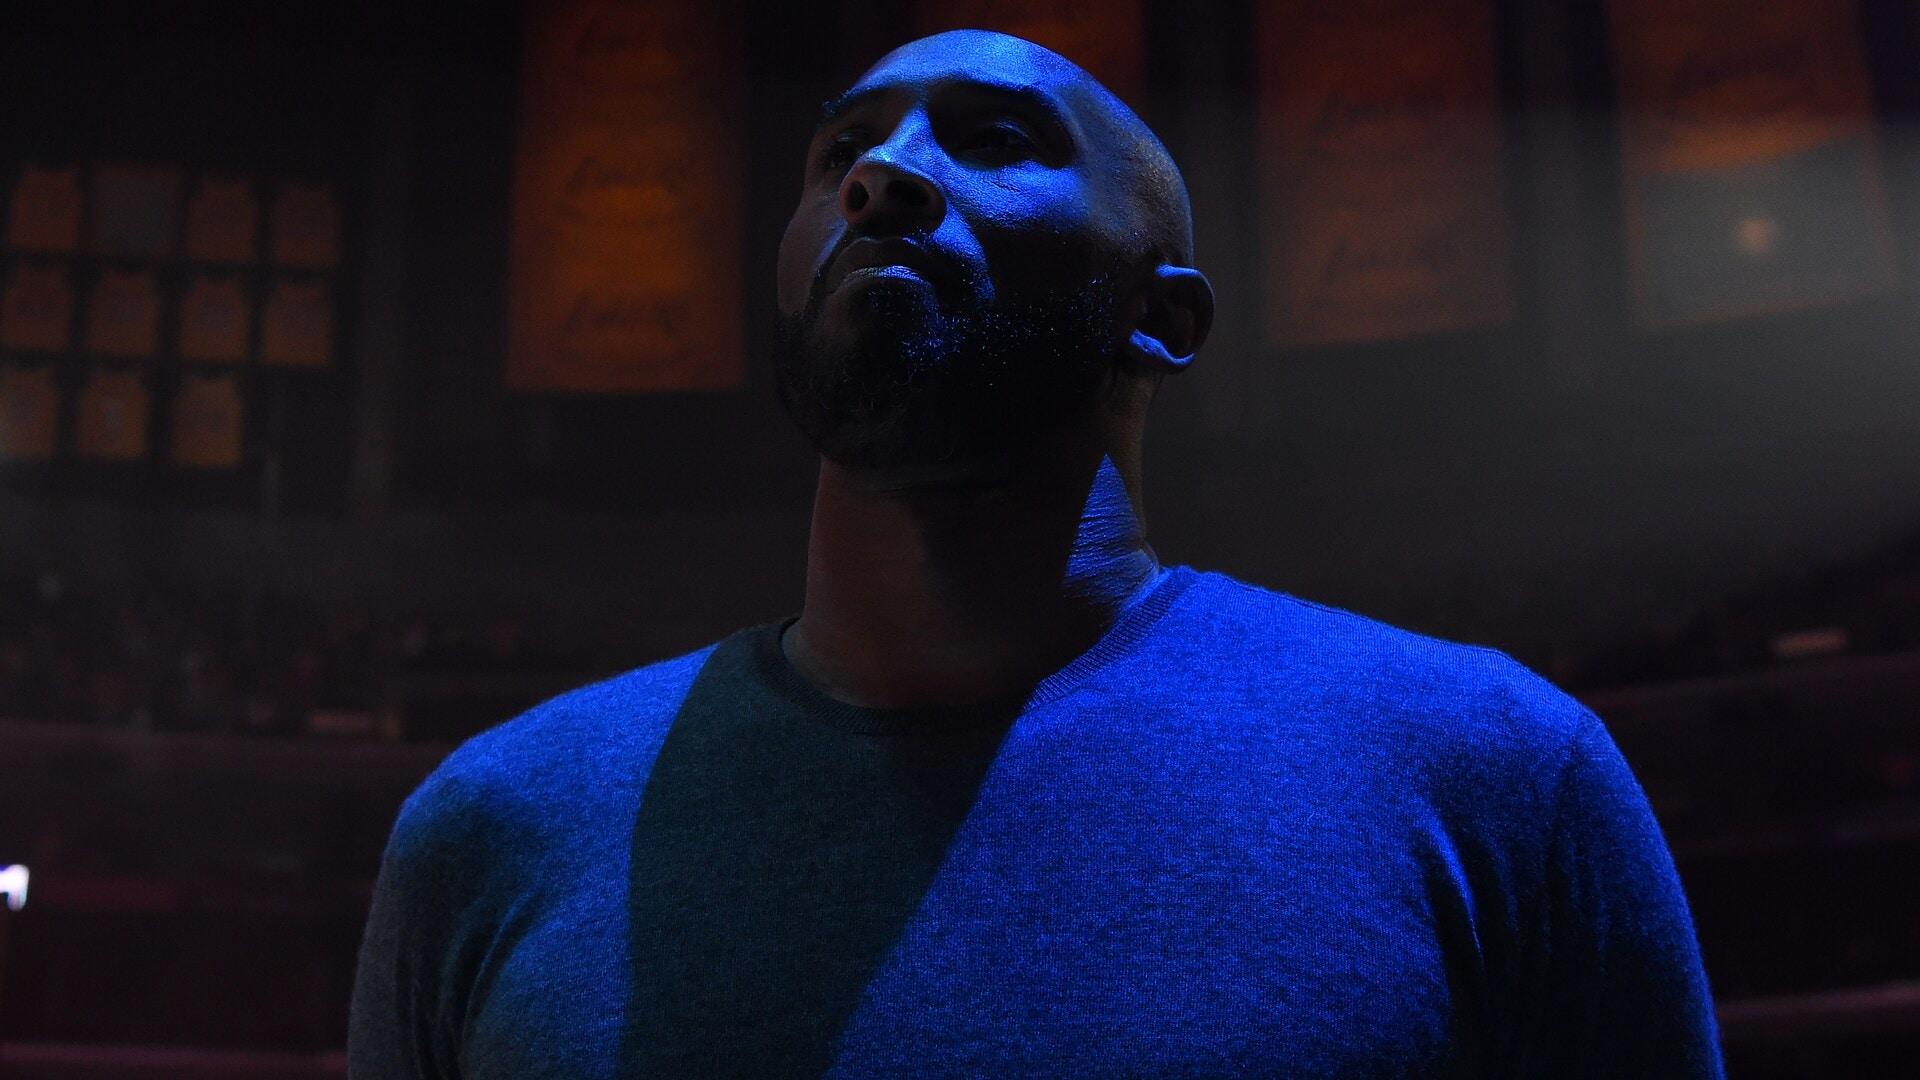 Italian basketball federation to mourn Kobe Bryant for entire week